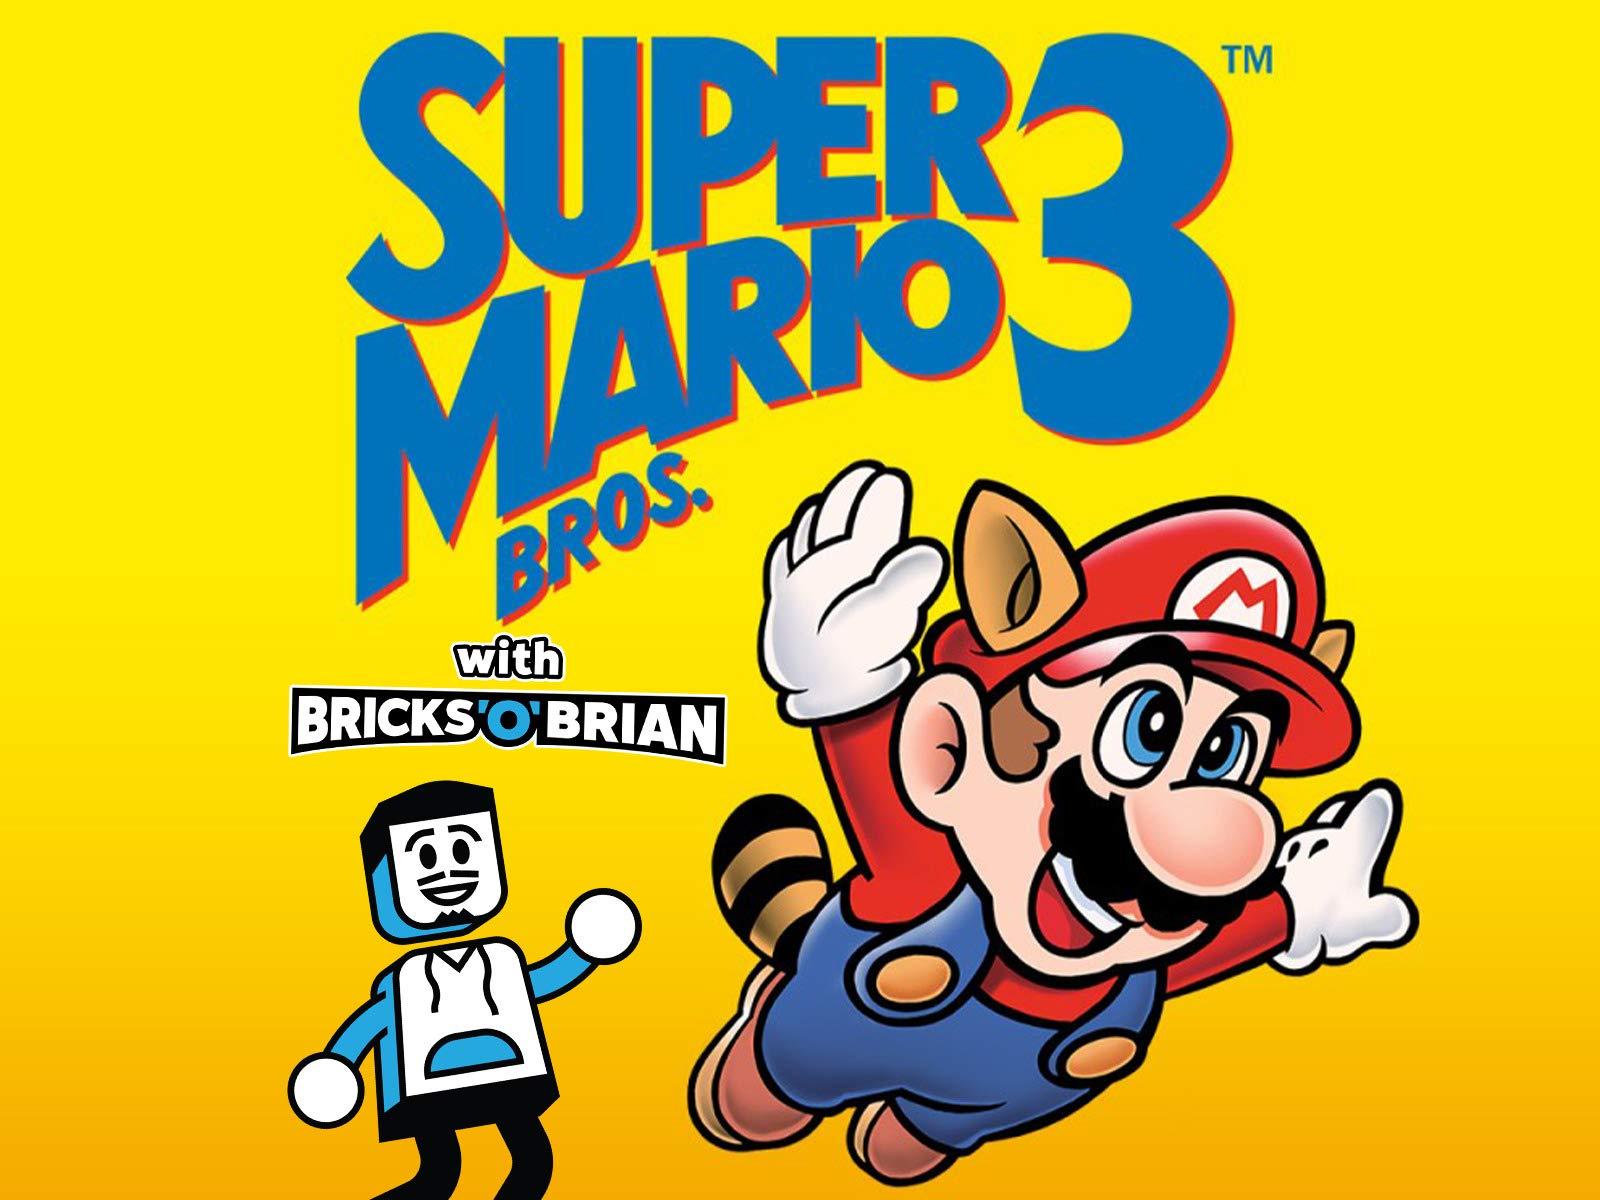 Clip: Super Mario Bros. 3 with Bricks 'O' Brian! - Season 1